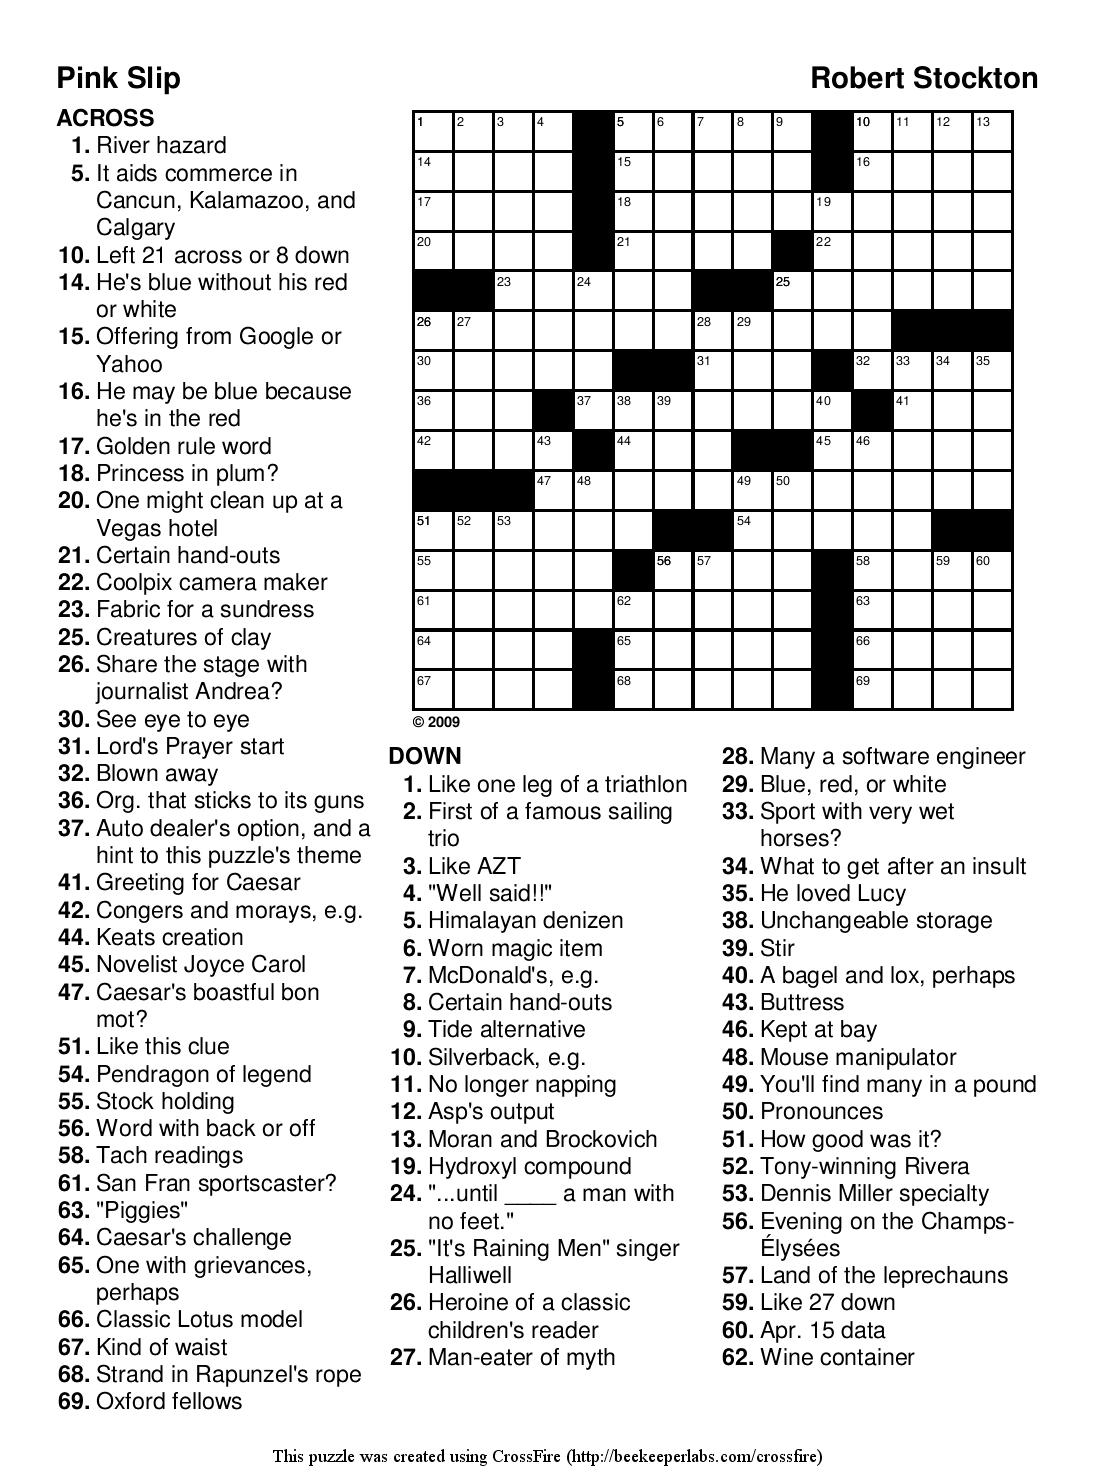 Cherise (Galisonb) On Pinterest - Printable Crossword Puzzles In Afrikaans